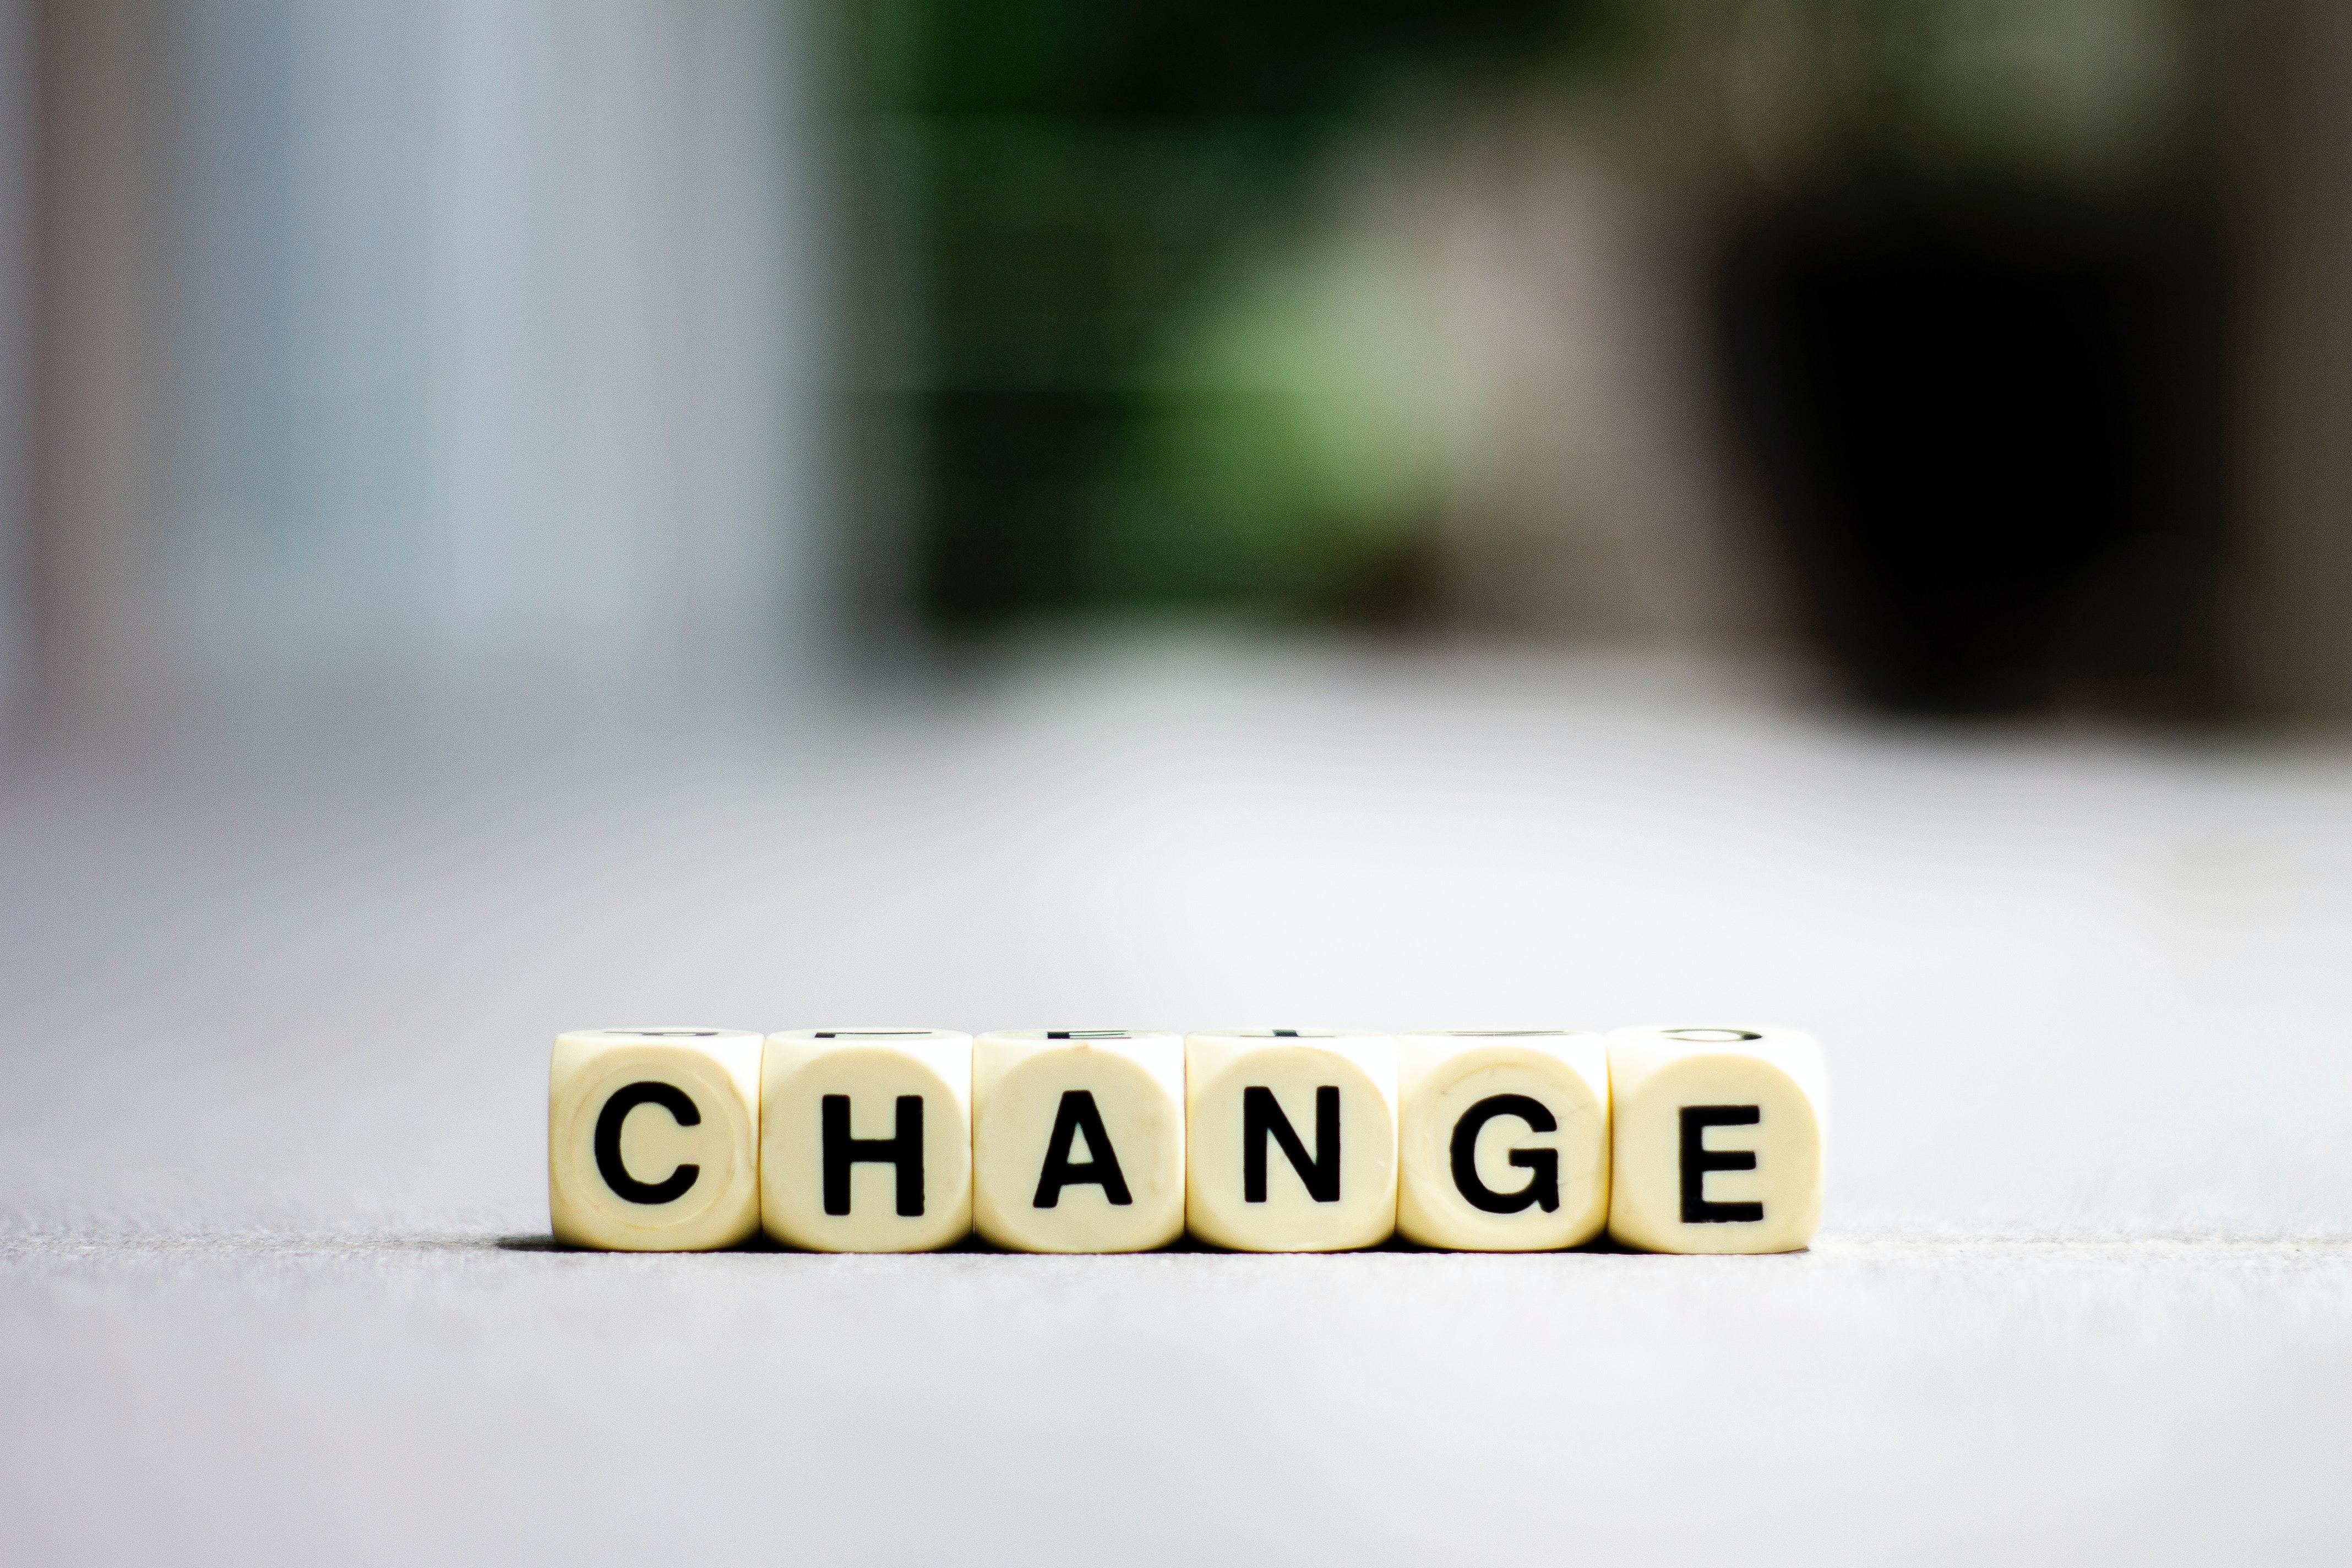 shallow-focus-photo-of-change-4502492